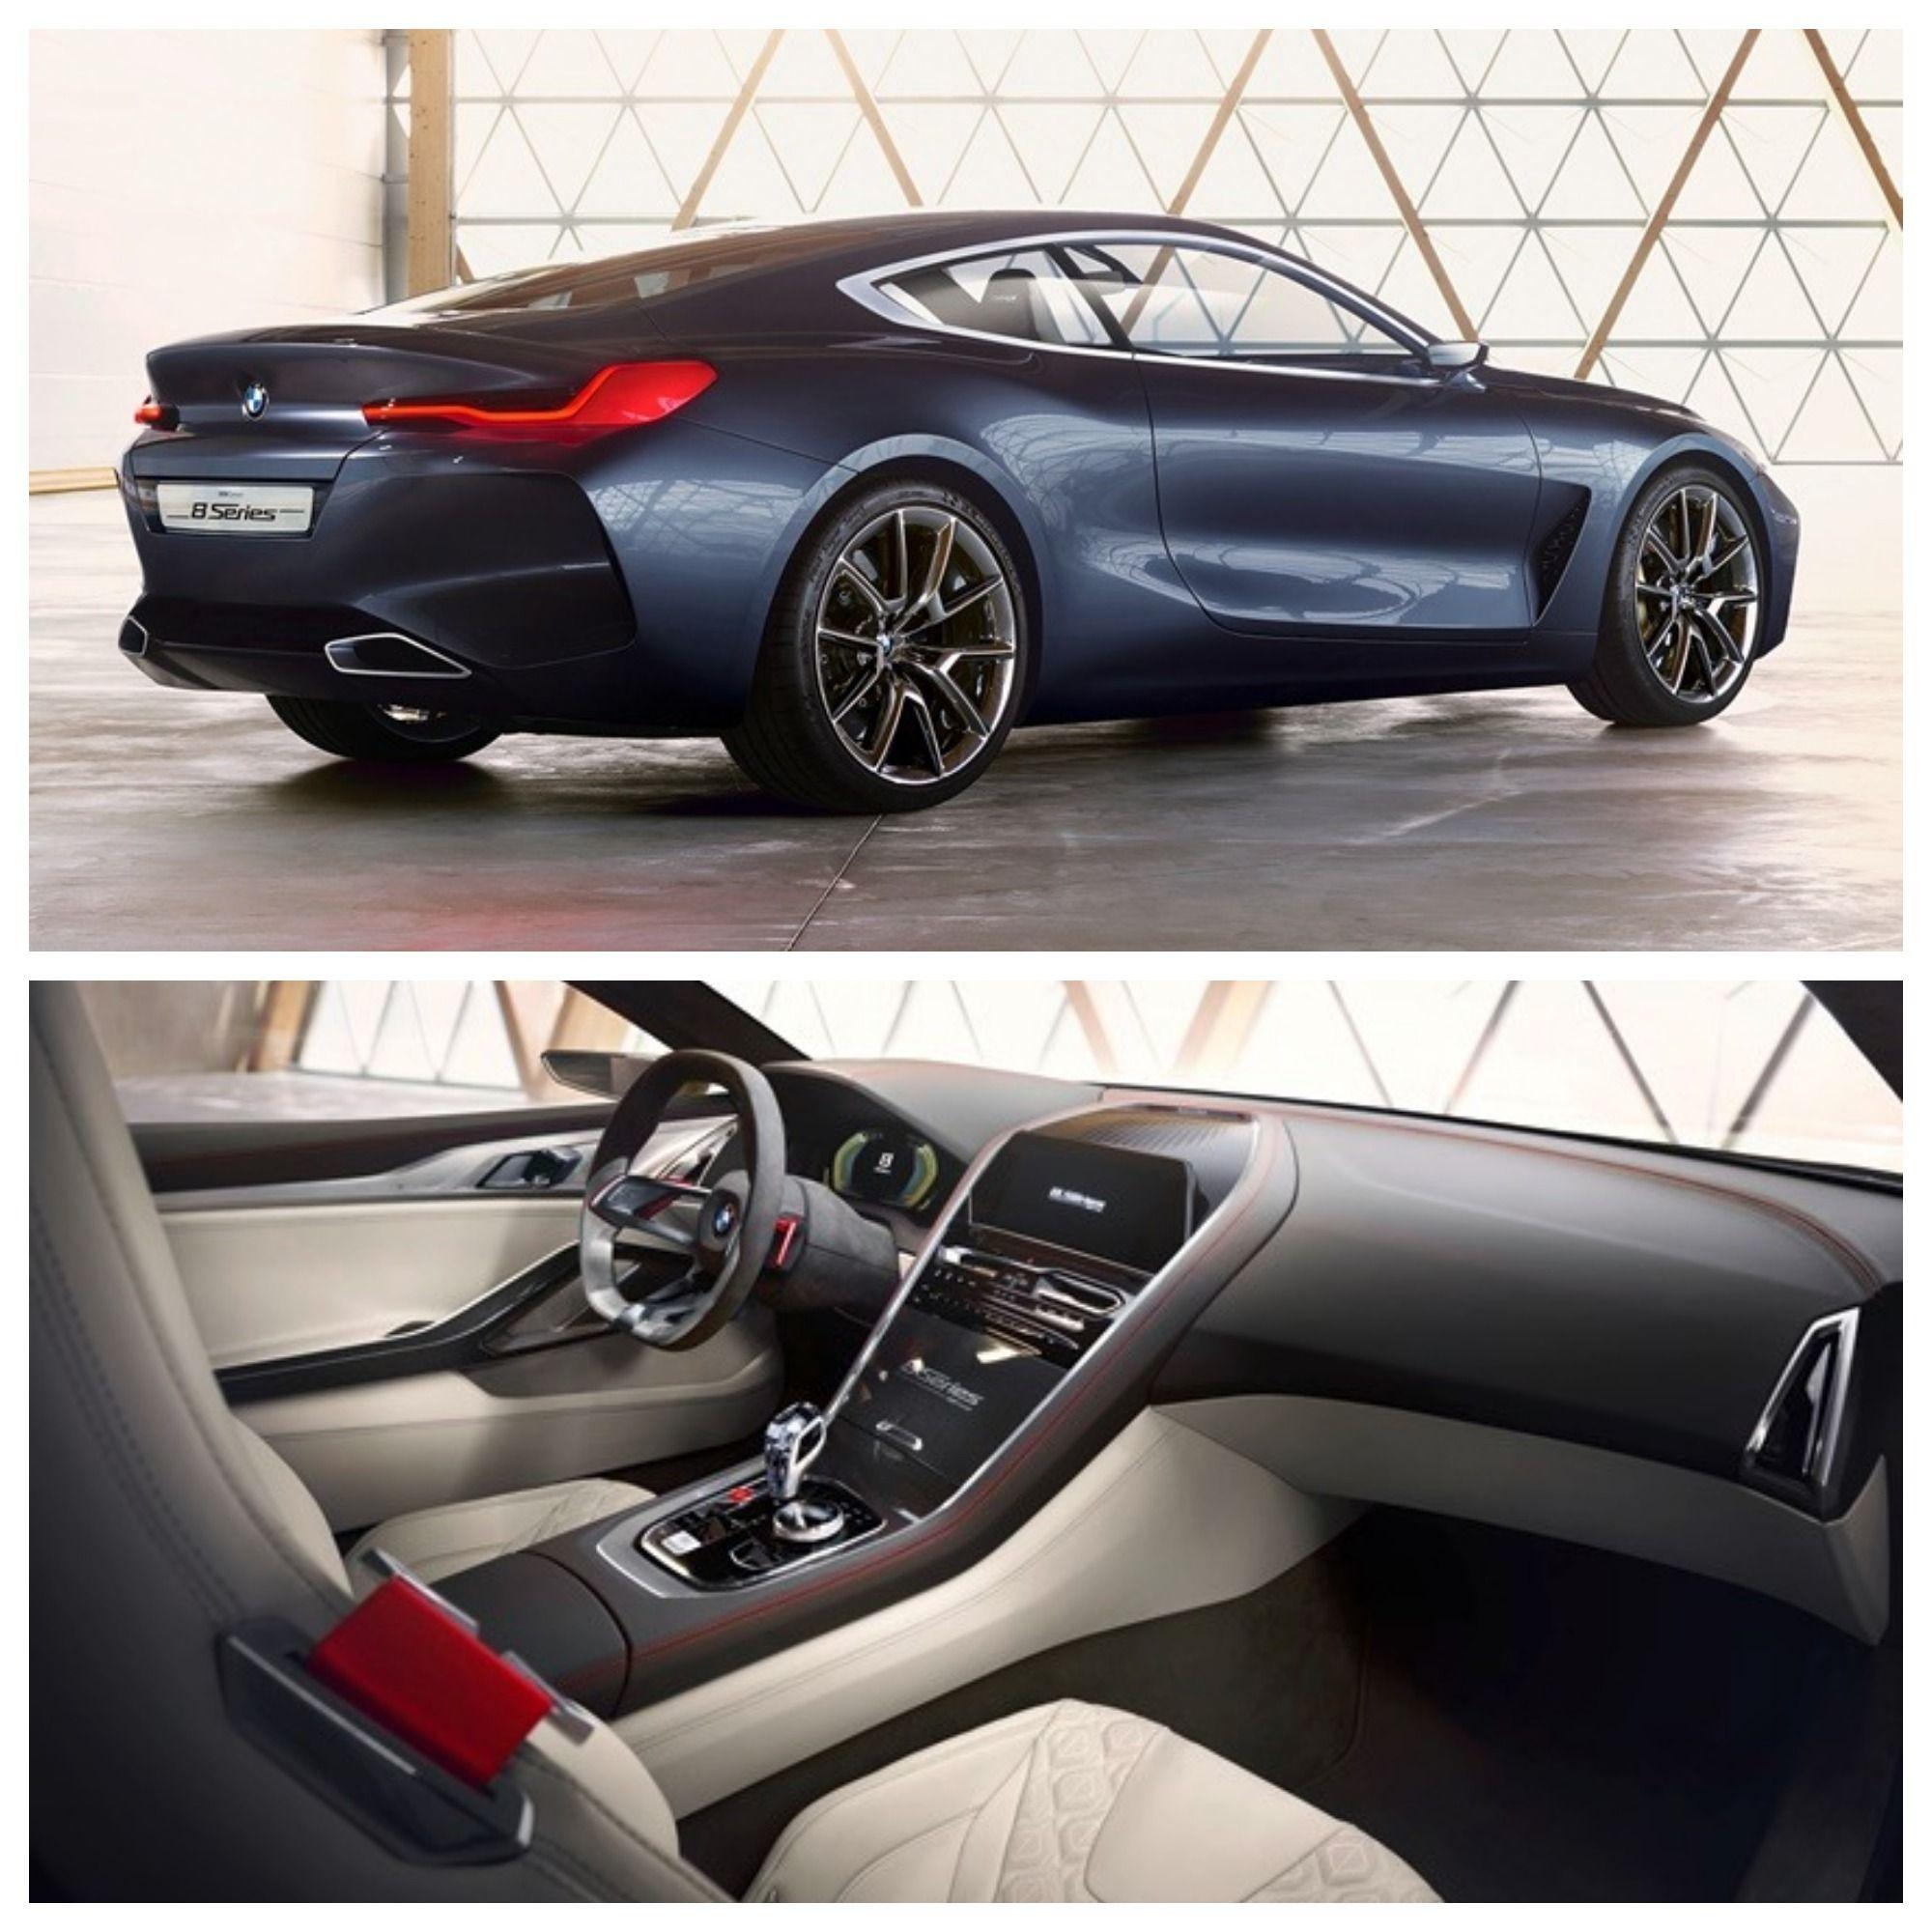 2018 BMW 8 Series Concept Bmw, Concept cars, Cars